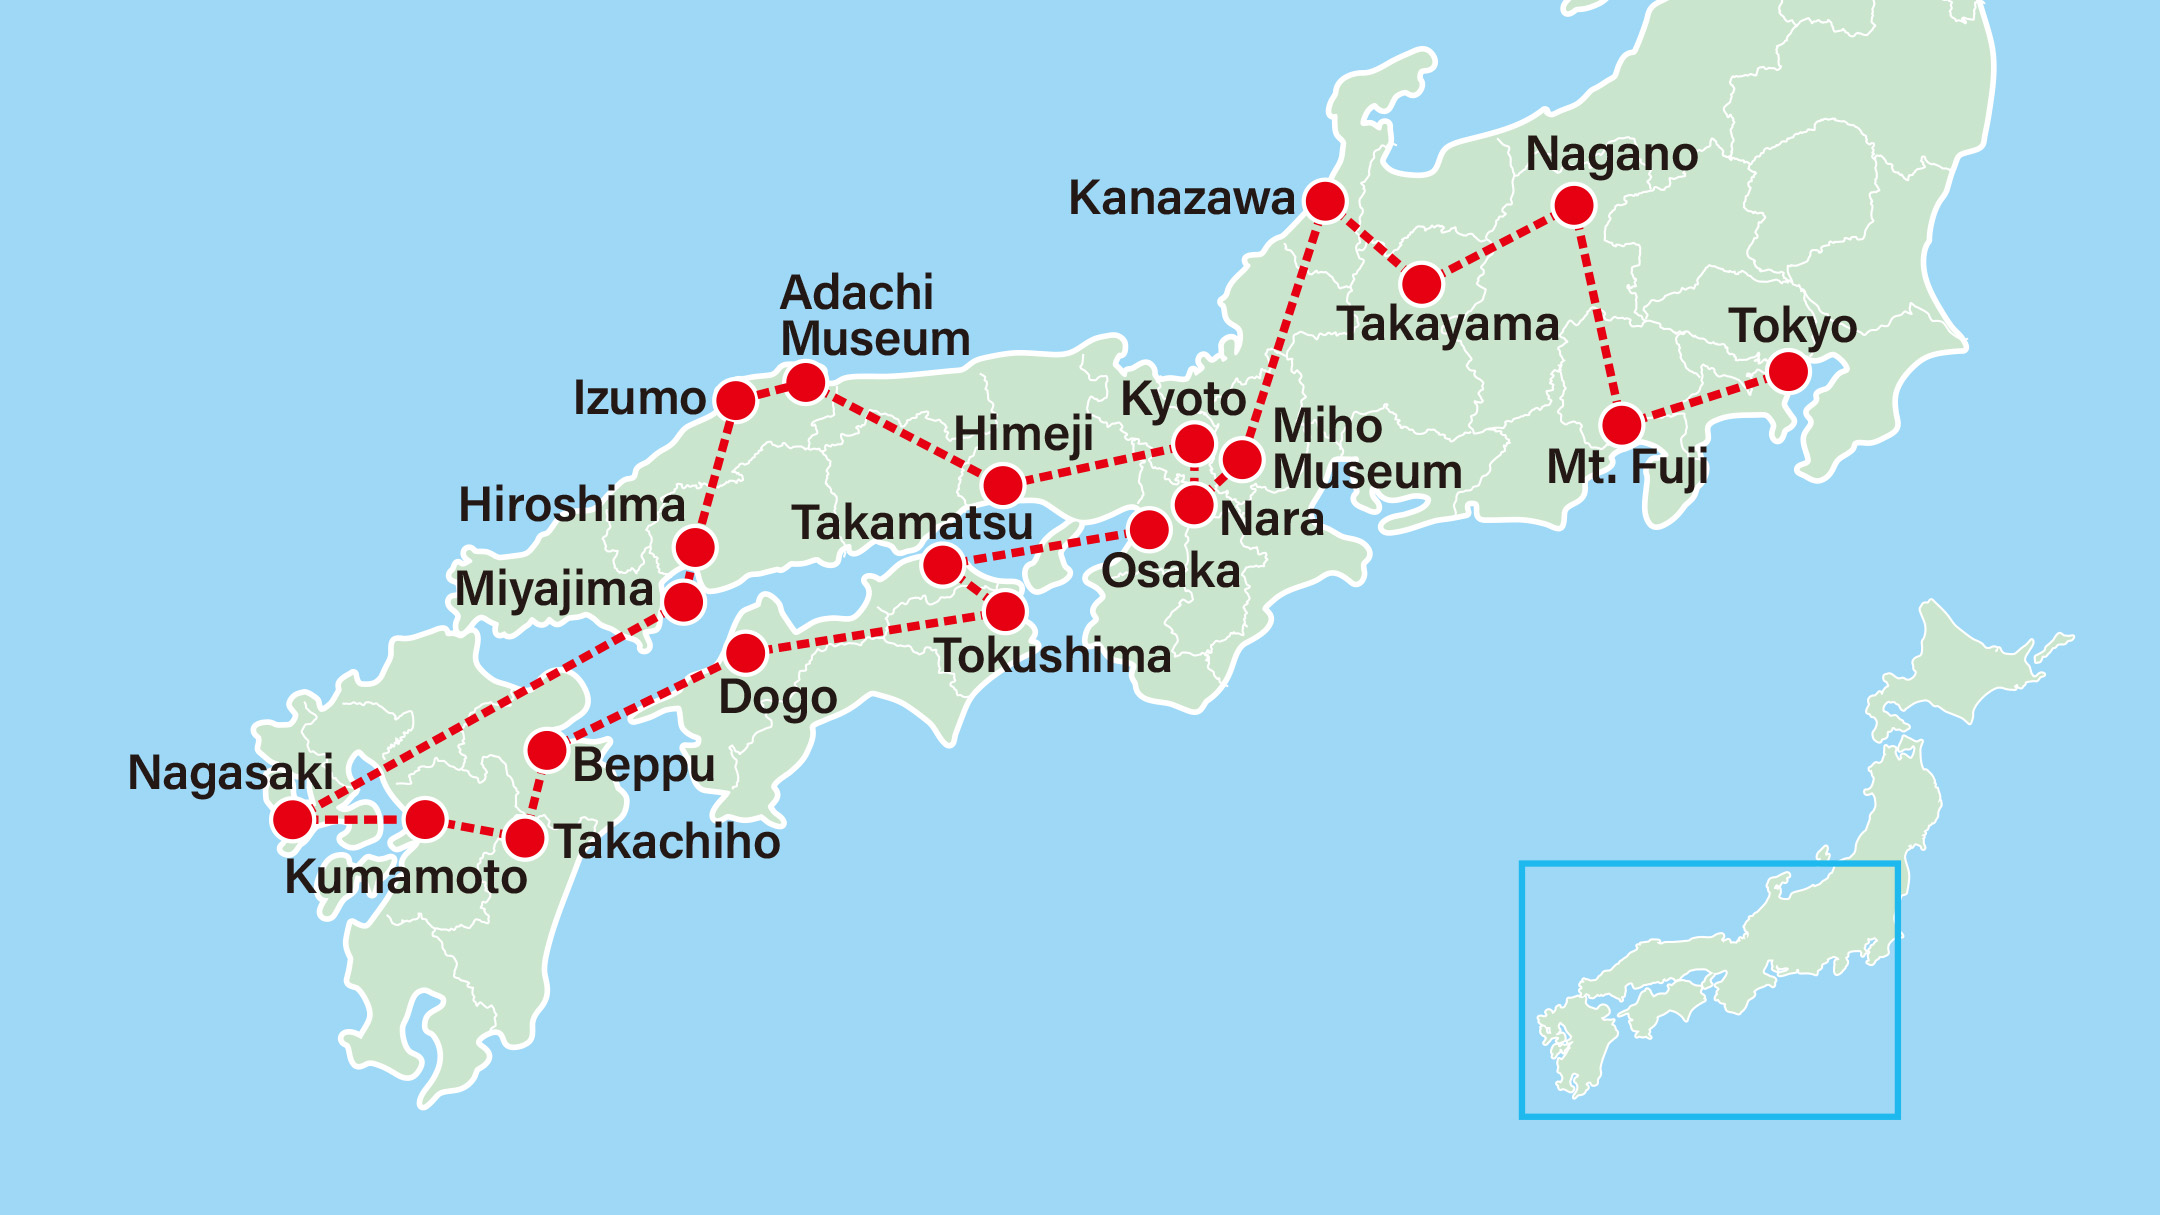 Grand Takayama Autumn Festival Tour-Tokyo-Itchiku Kubota Art Museum-Matsumoto-Takayama-Kanazawa-Miho Museum-Nara-Kyoto-Adachi-Hiroshima-Miyajima-Nagasaki-Kumamoto-Takachiho-Beppu-Dogo-Ritsurin Garden-Kobe